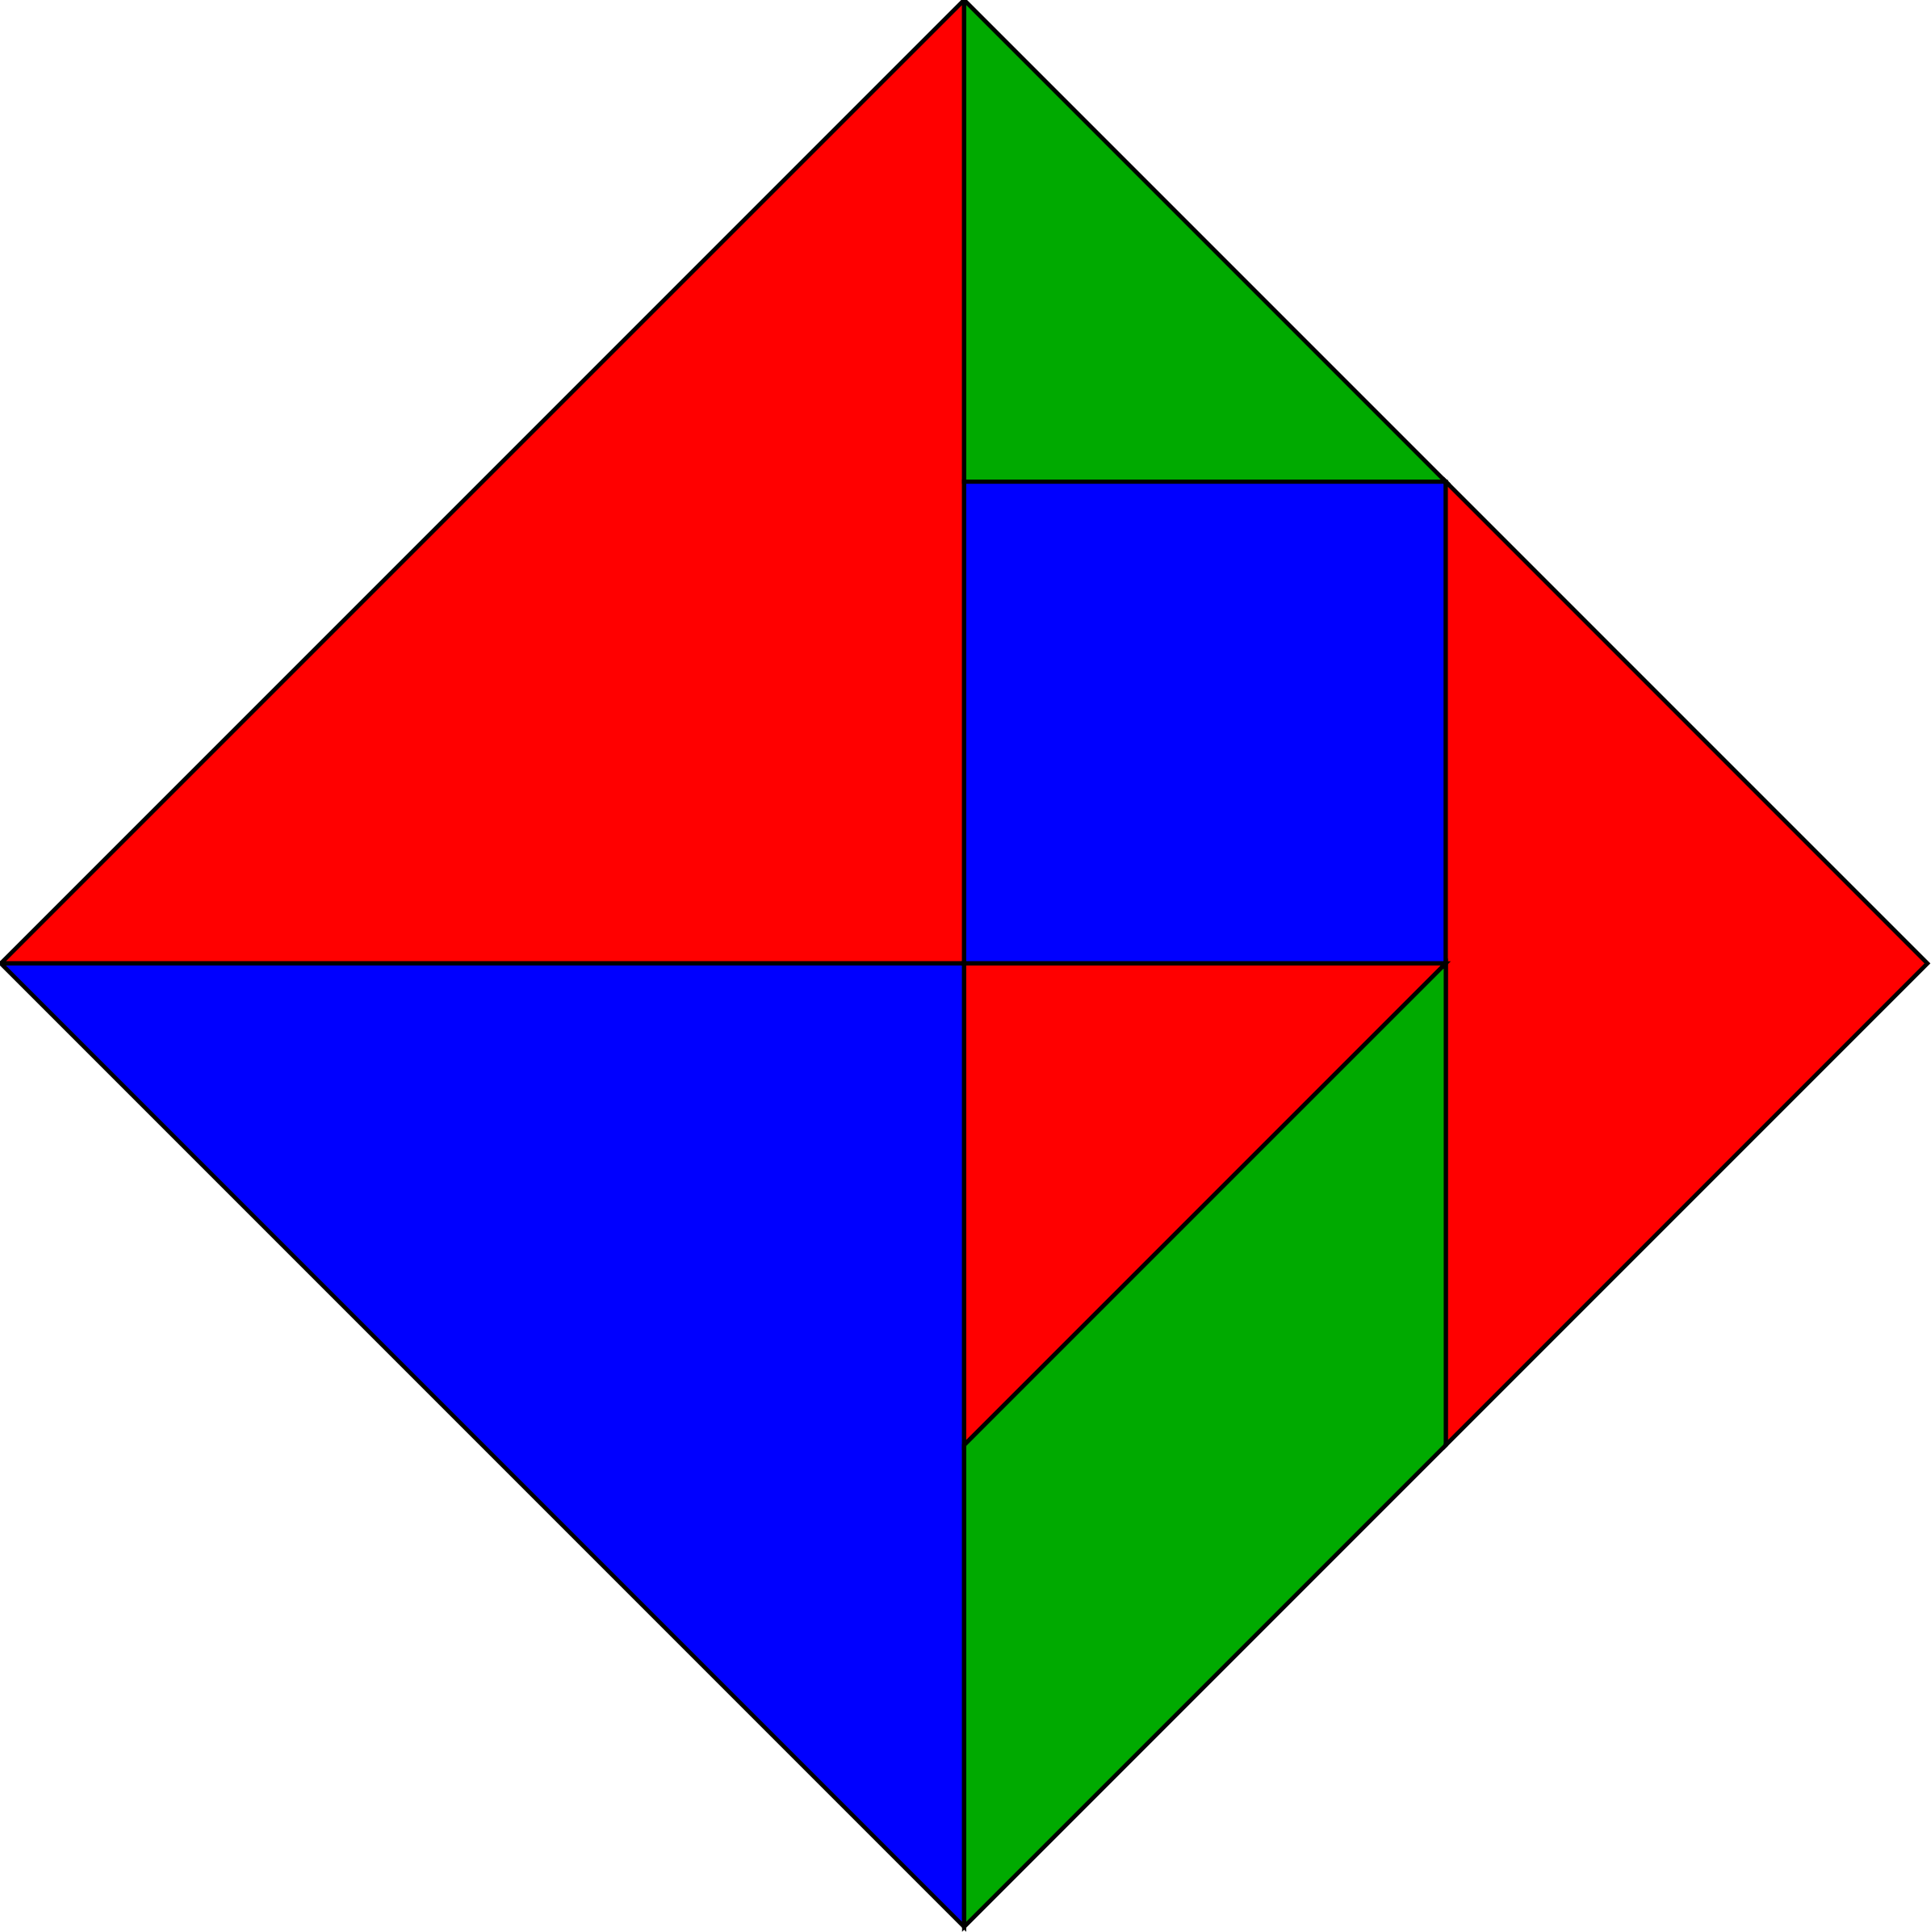 Triangular clipart rgb. Tangram rectangle colors big